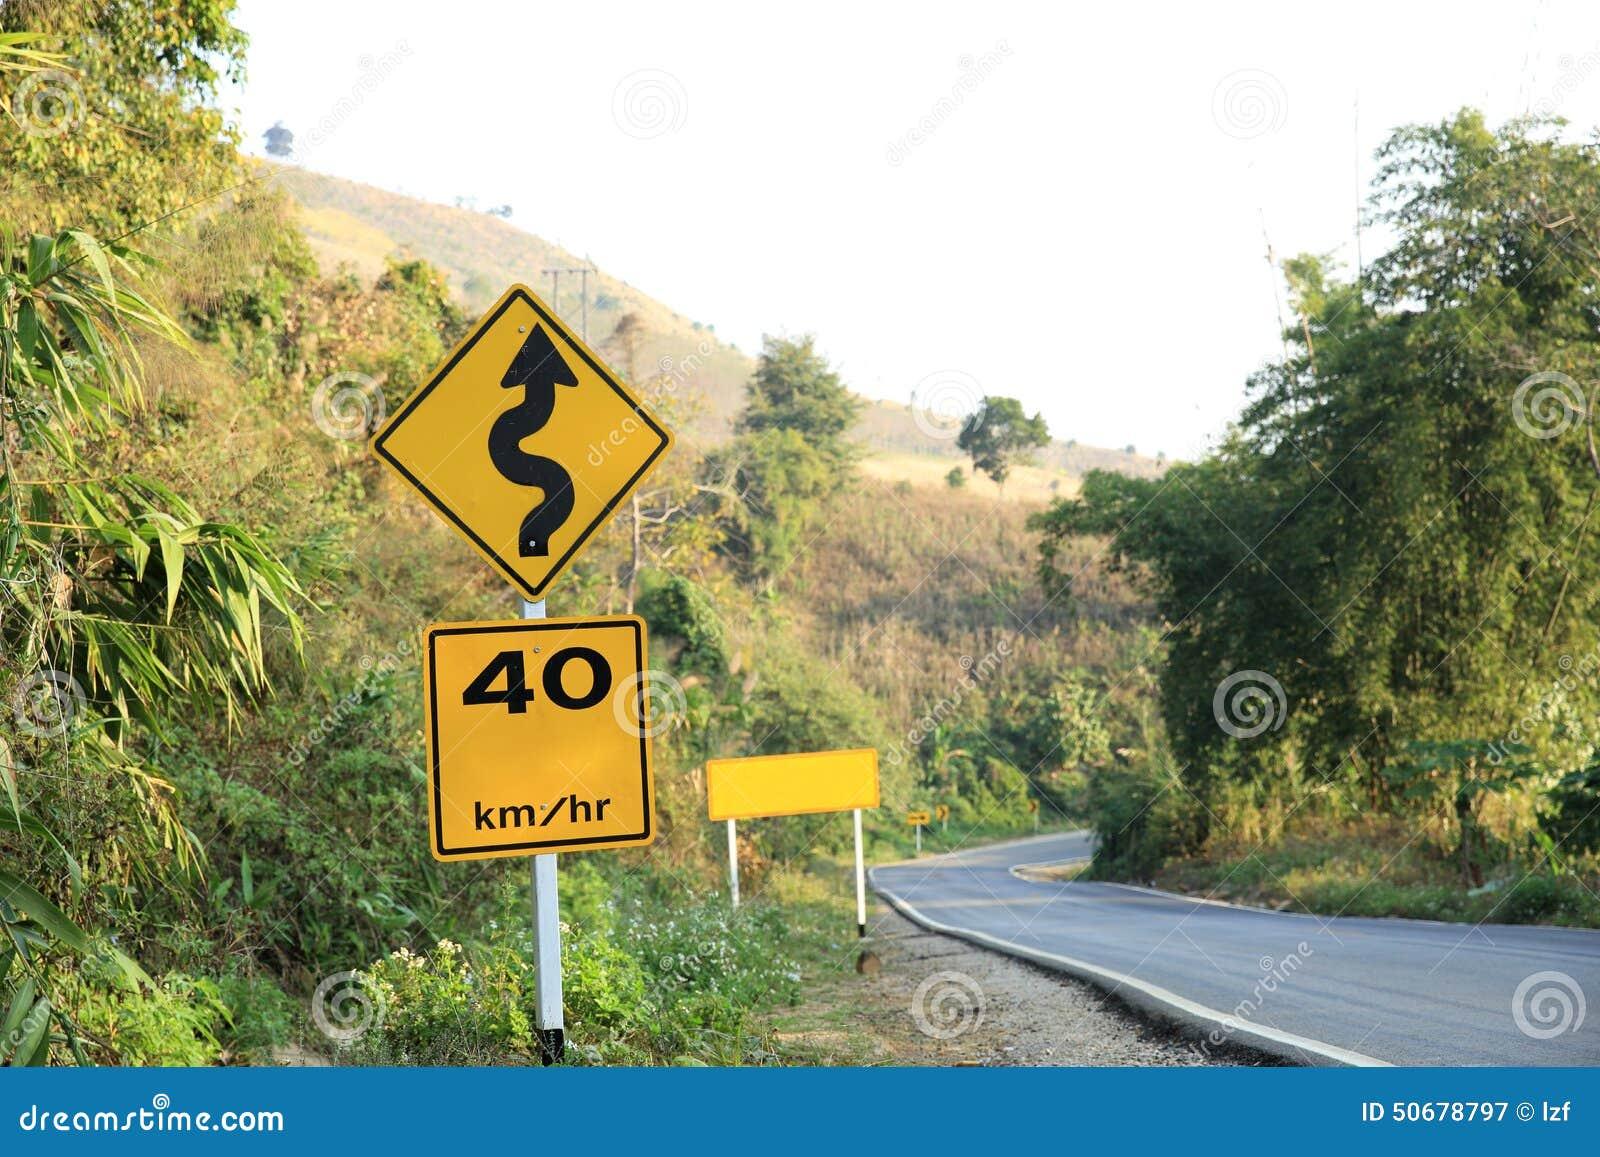 Download 在曲线山路旁边的路标 库存图片. 图片 包括有 泰国, 警告, 绿色, 横向, 室外, 黄色, 锋利, 空白 - 50678797